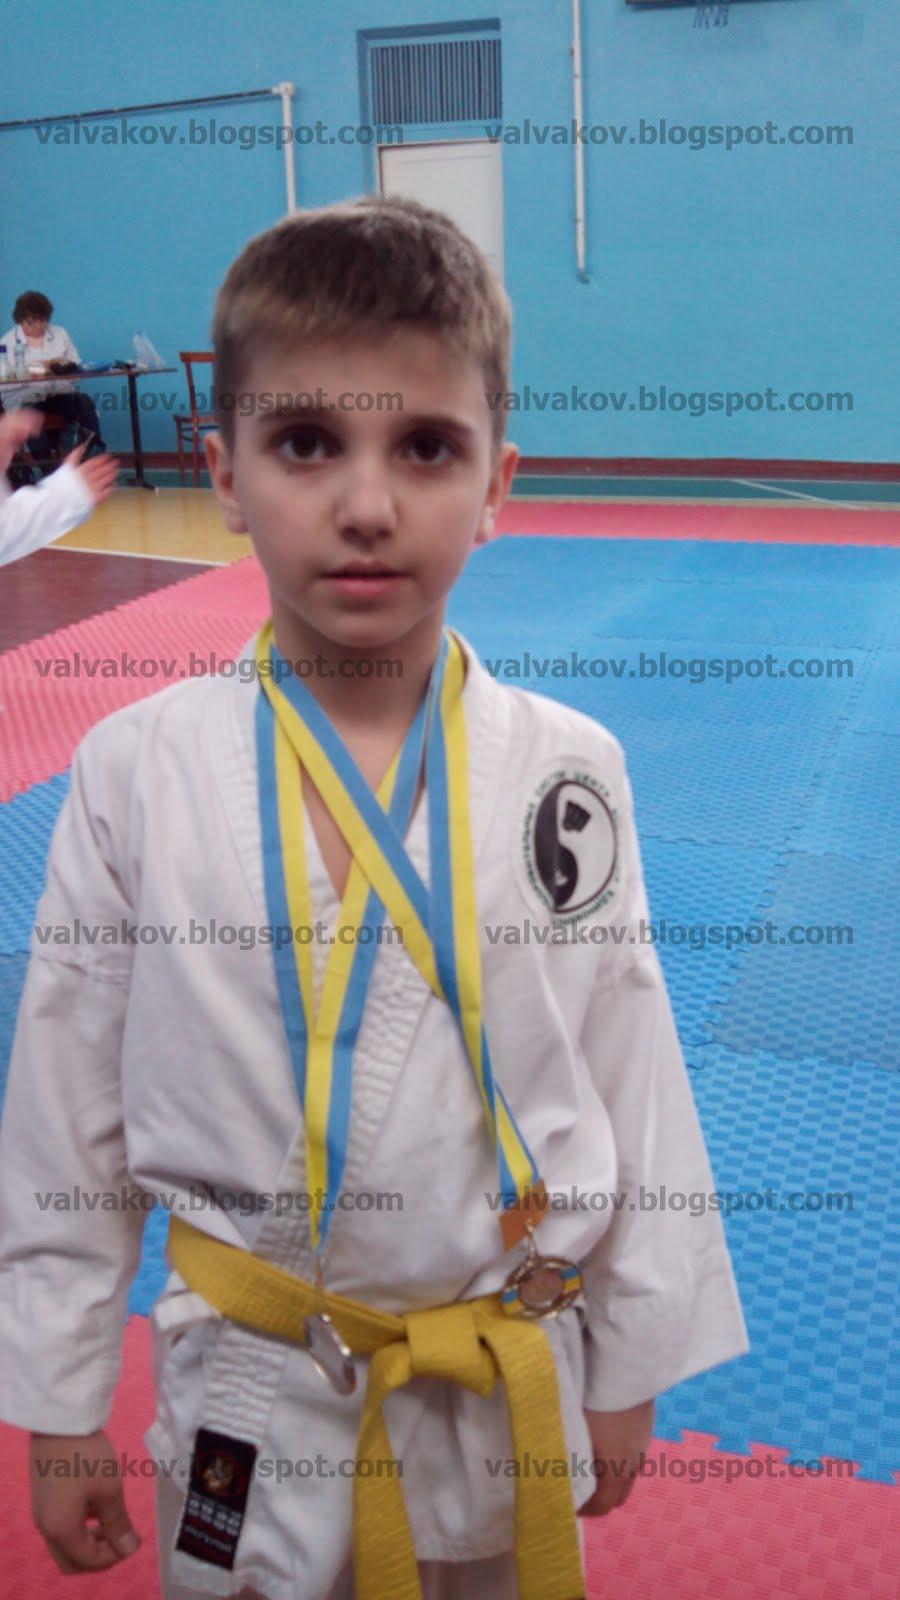 Поддержите ребенка спортсмена